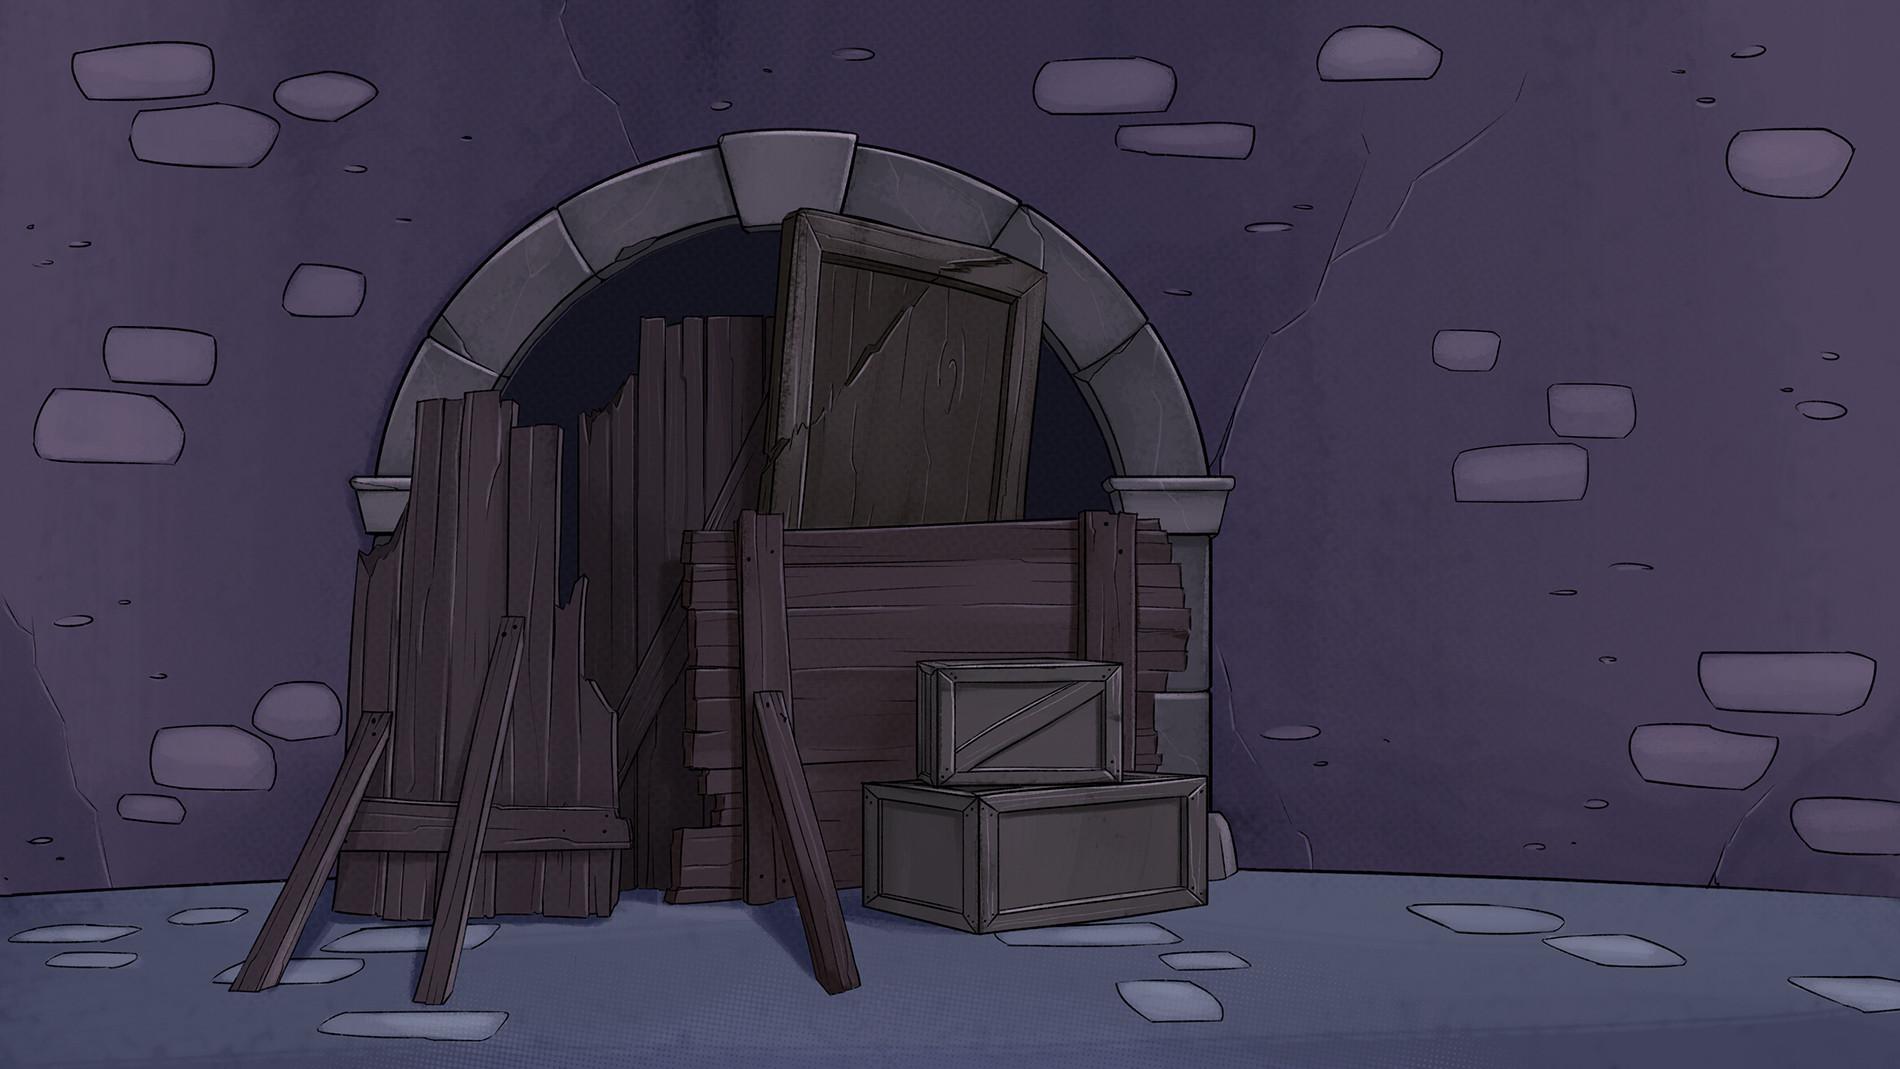 the barricade inside the monastery.